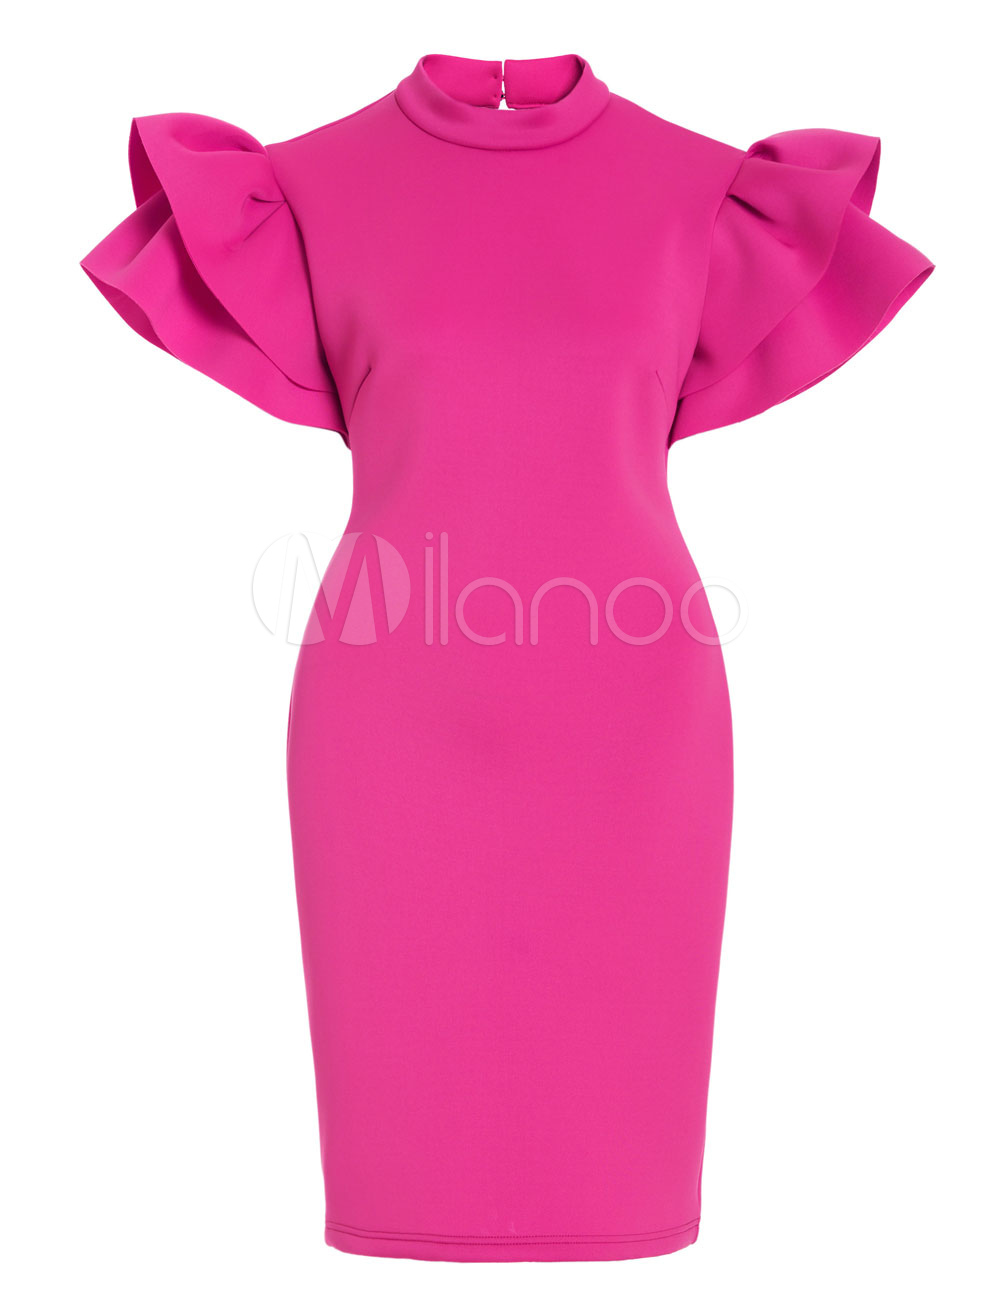 Women Vintage Dresses Rose Round Neck Short Sleeve Ruffles Backless Bodycon Dress